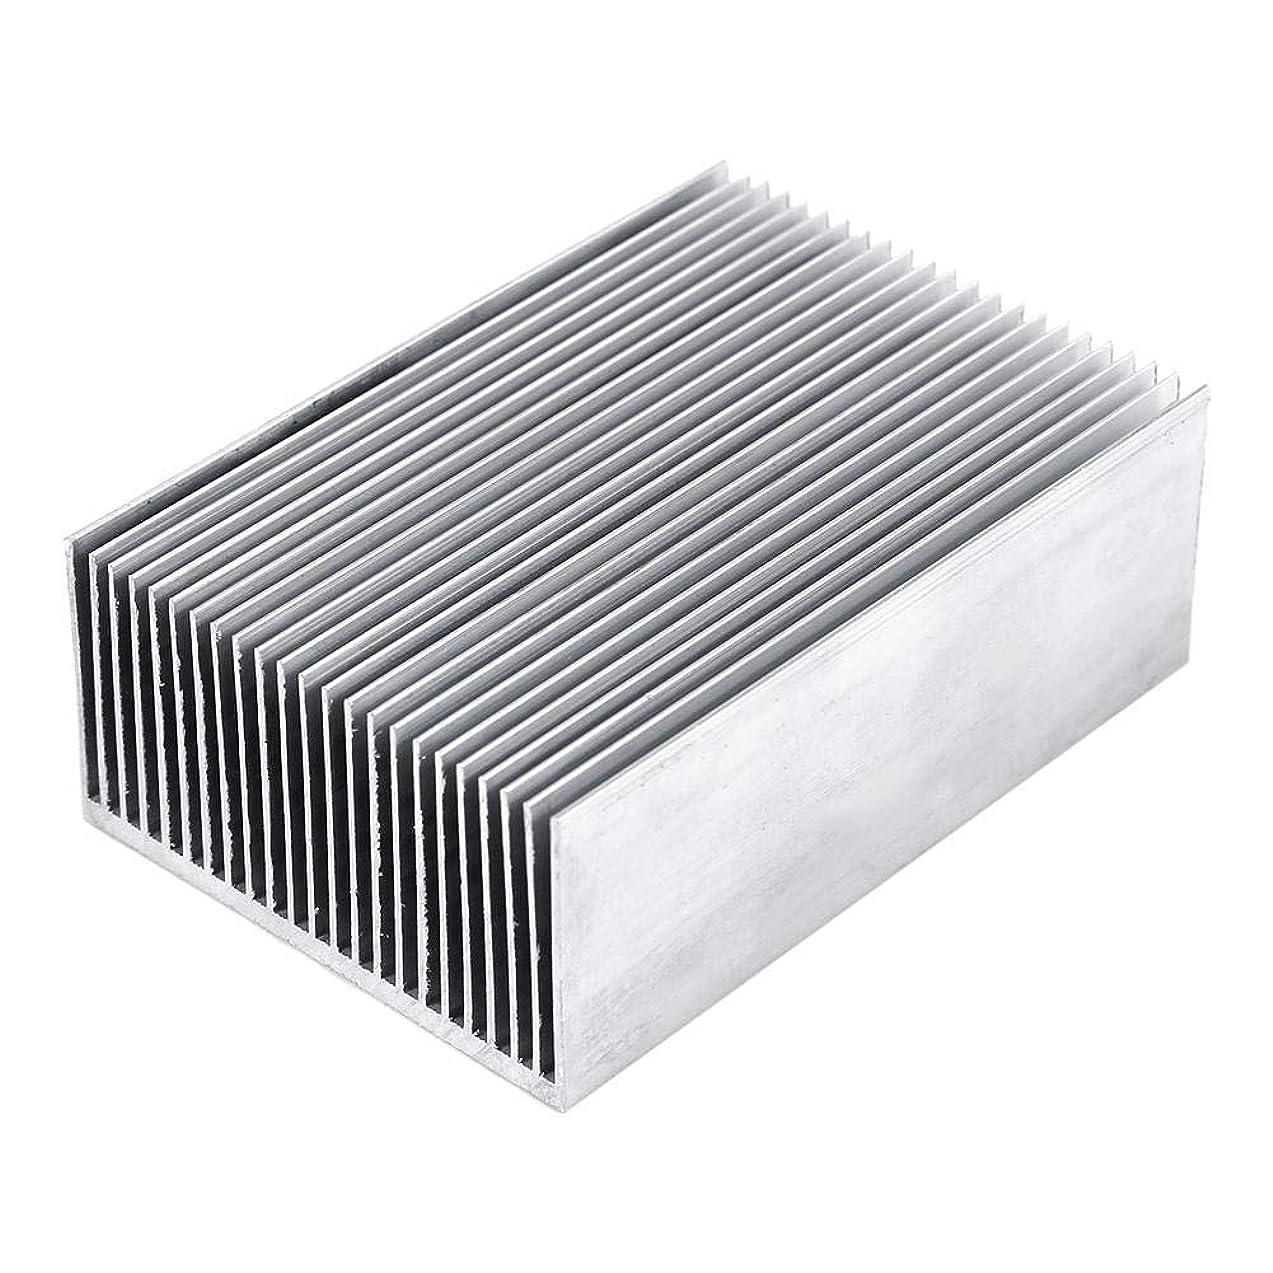 Aluminum Heatsink Cooling Fin Cooler for Led IC Module Or Computer 100(L) x 69(W) x 36 mm(H)